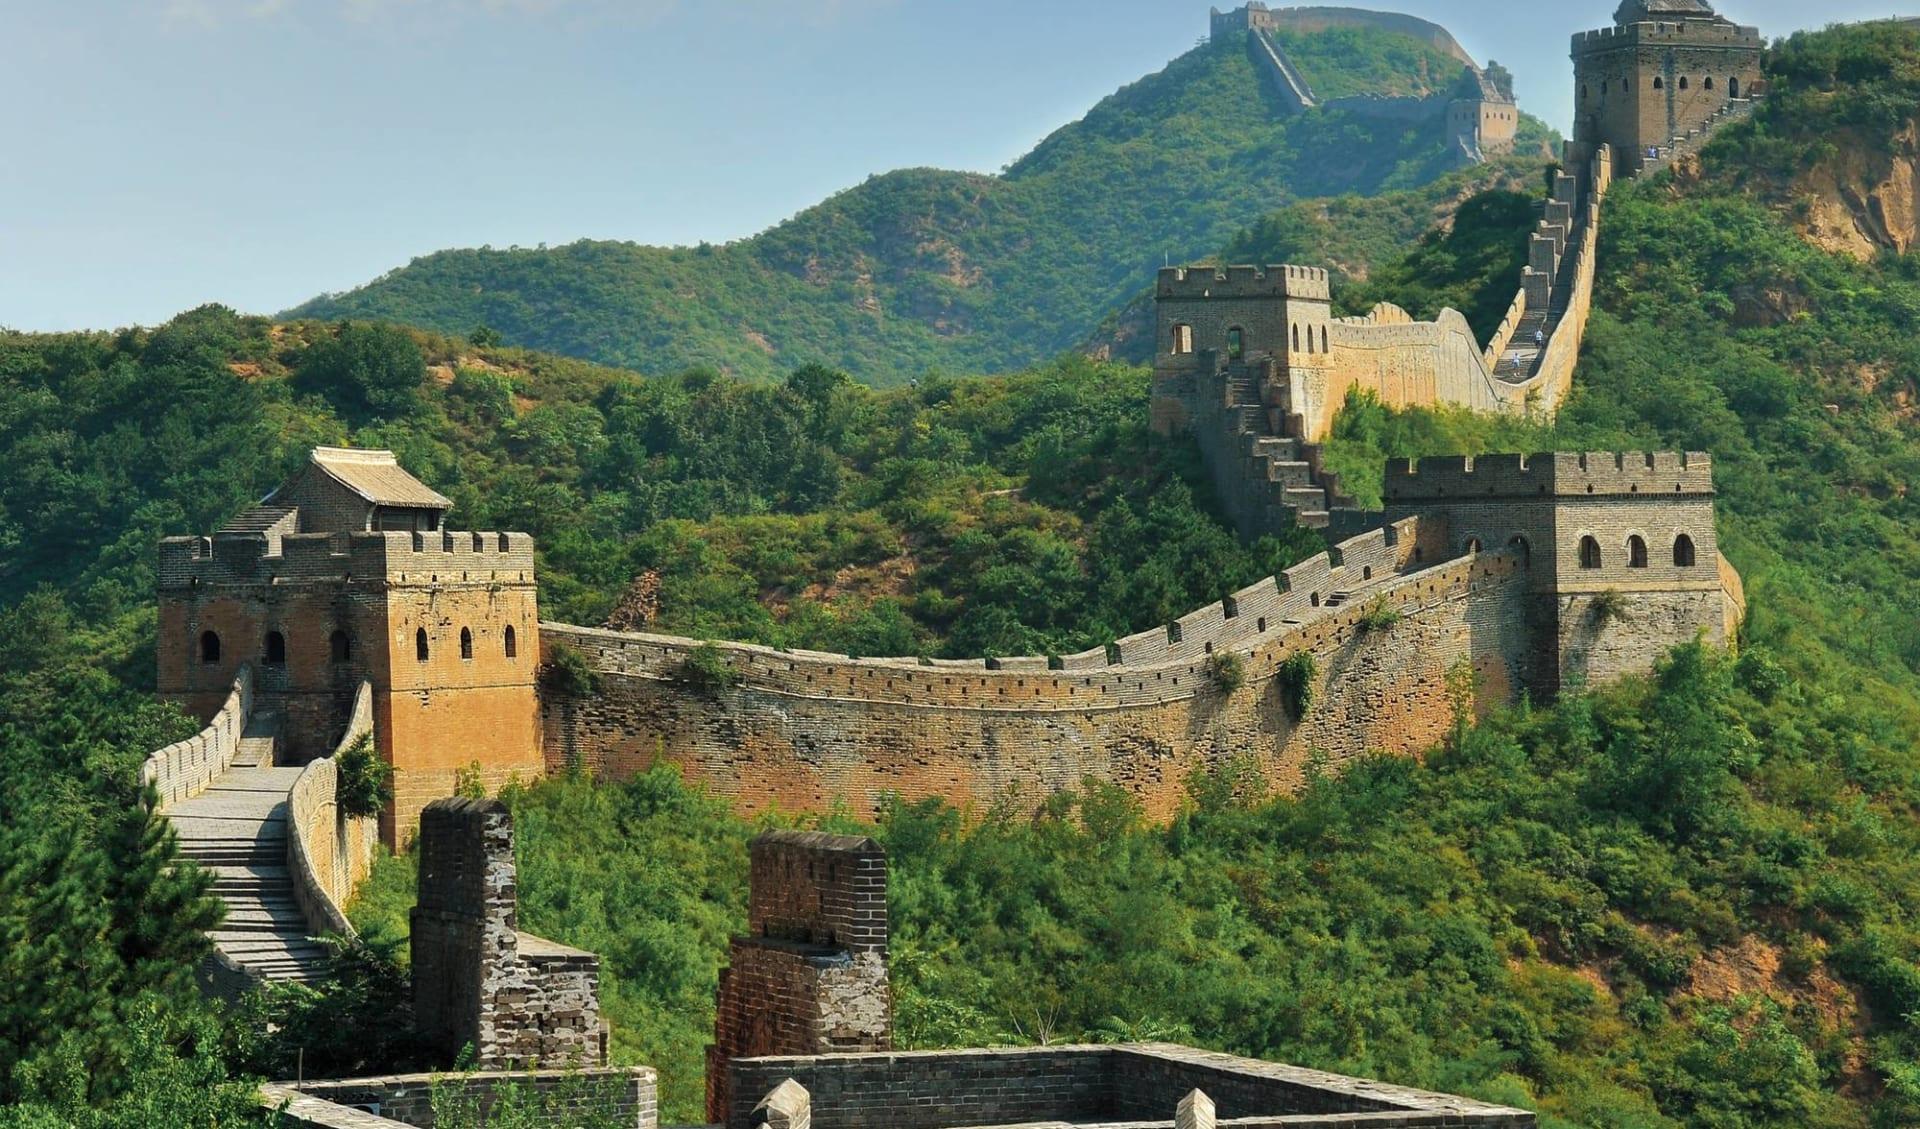 Sonderzug Zarengold Moskau - Peking: China_Grosse_Mauer_shutterstock_121691959_HungChungChih